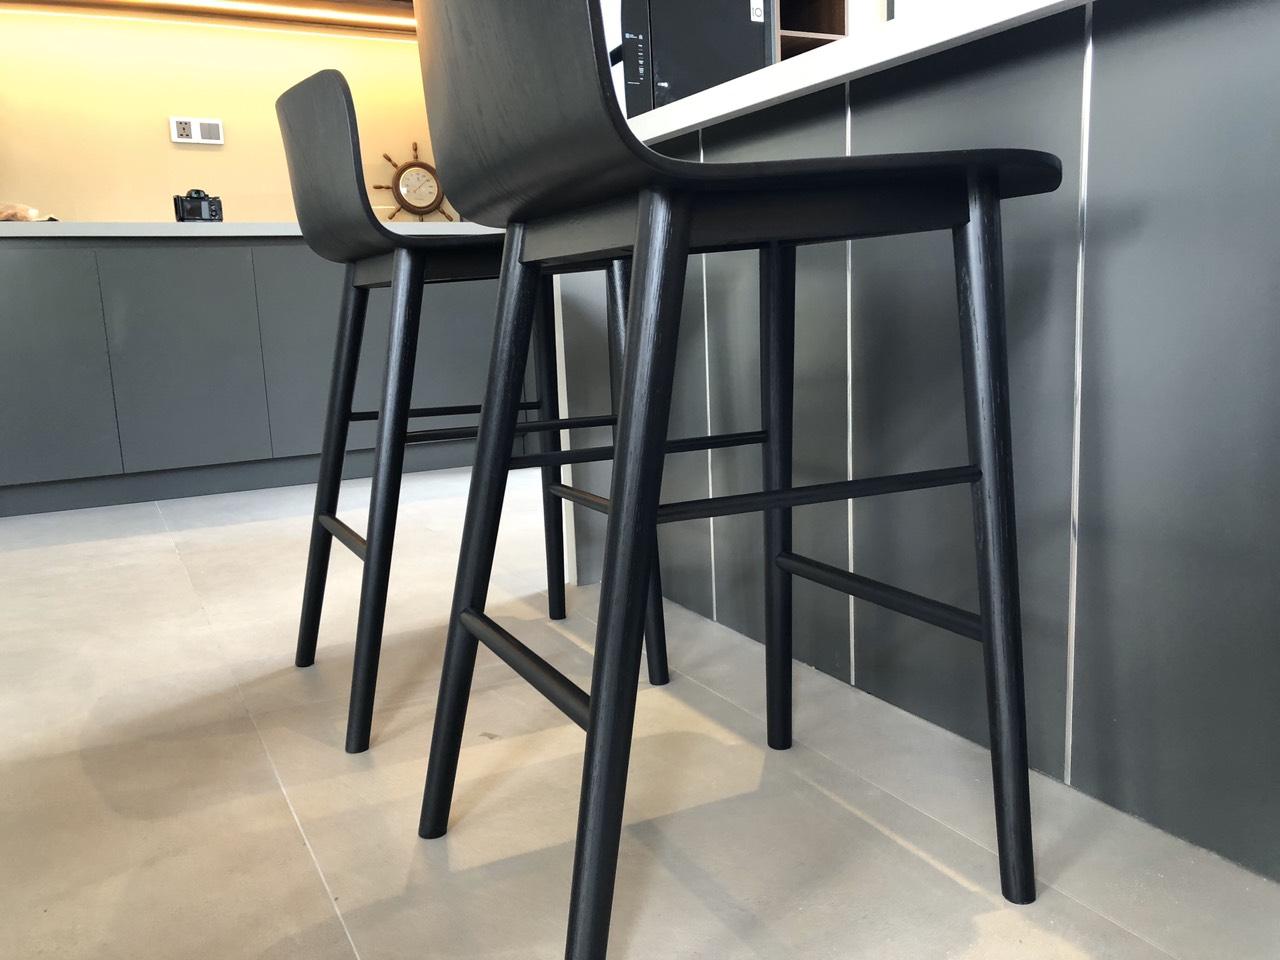 Ghế bar gỗ sồi tự nhiên Tami CC4/20